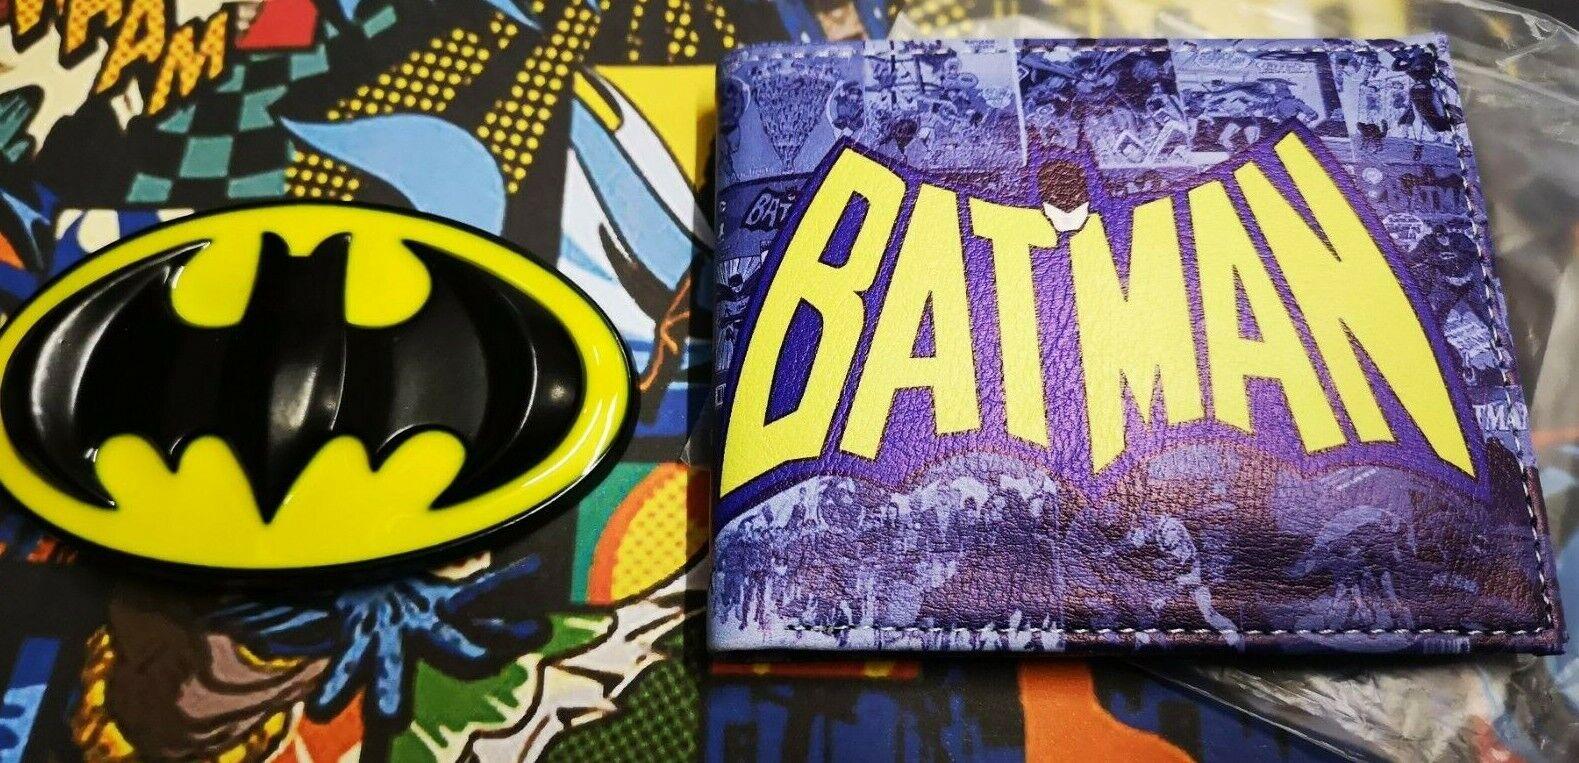 Batman belt buckle & batman super hero Wallet Comic book heroes THE BATMAN